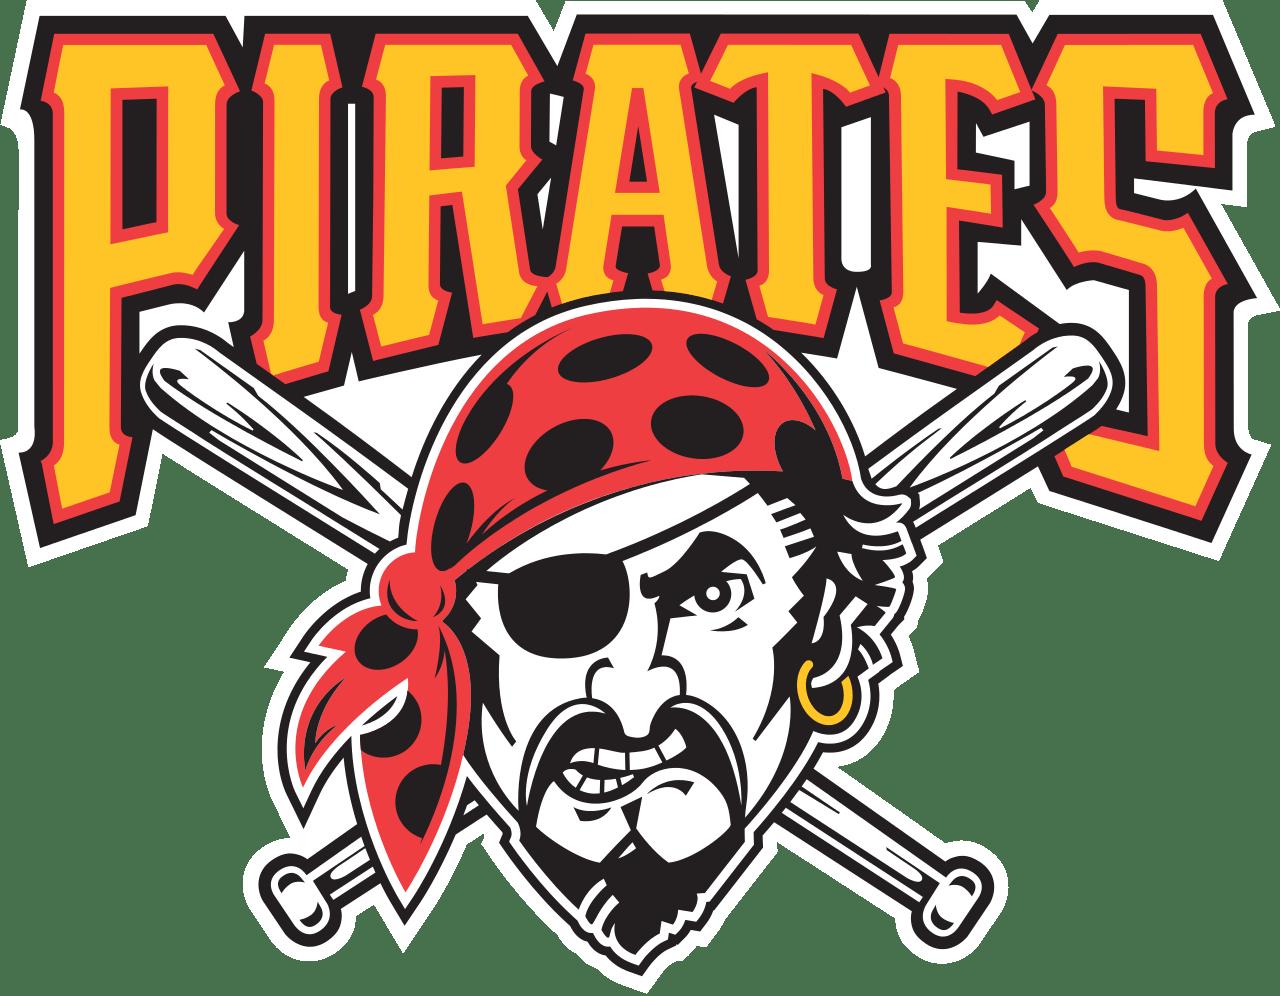 Pirate football clipart image transparent download Pittsburgh Pirates Pirate Logo transparent PNG - StickPNG image transparent download